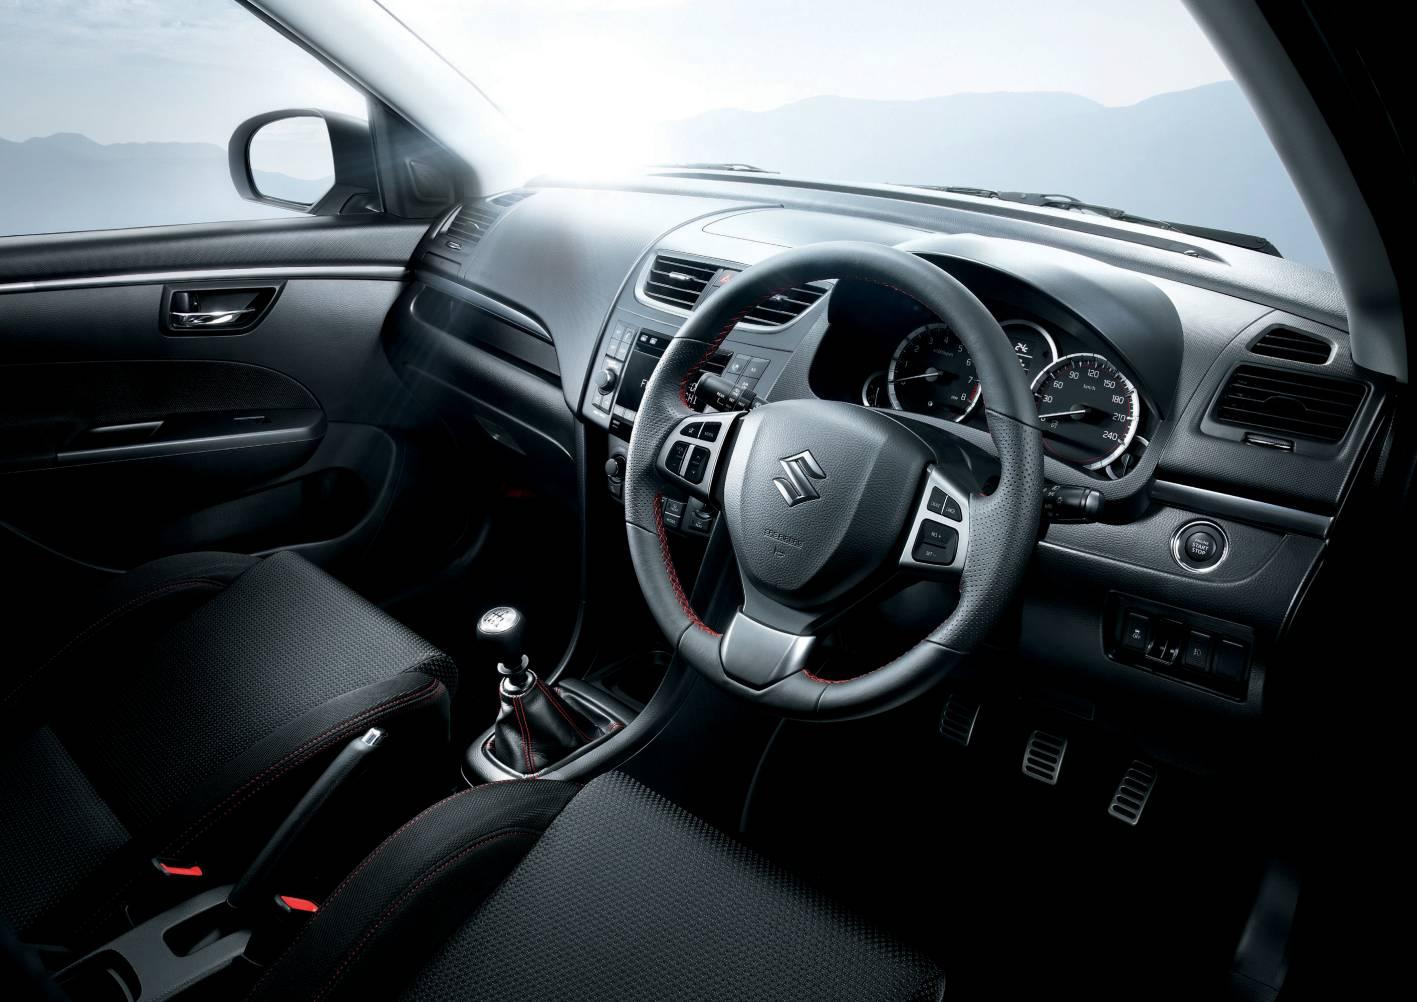 Image result for Suzuki Swift yellow inside